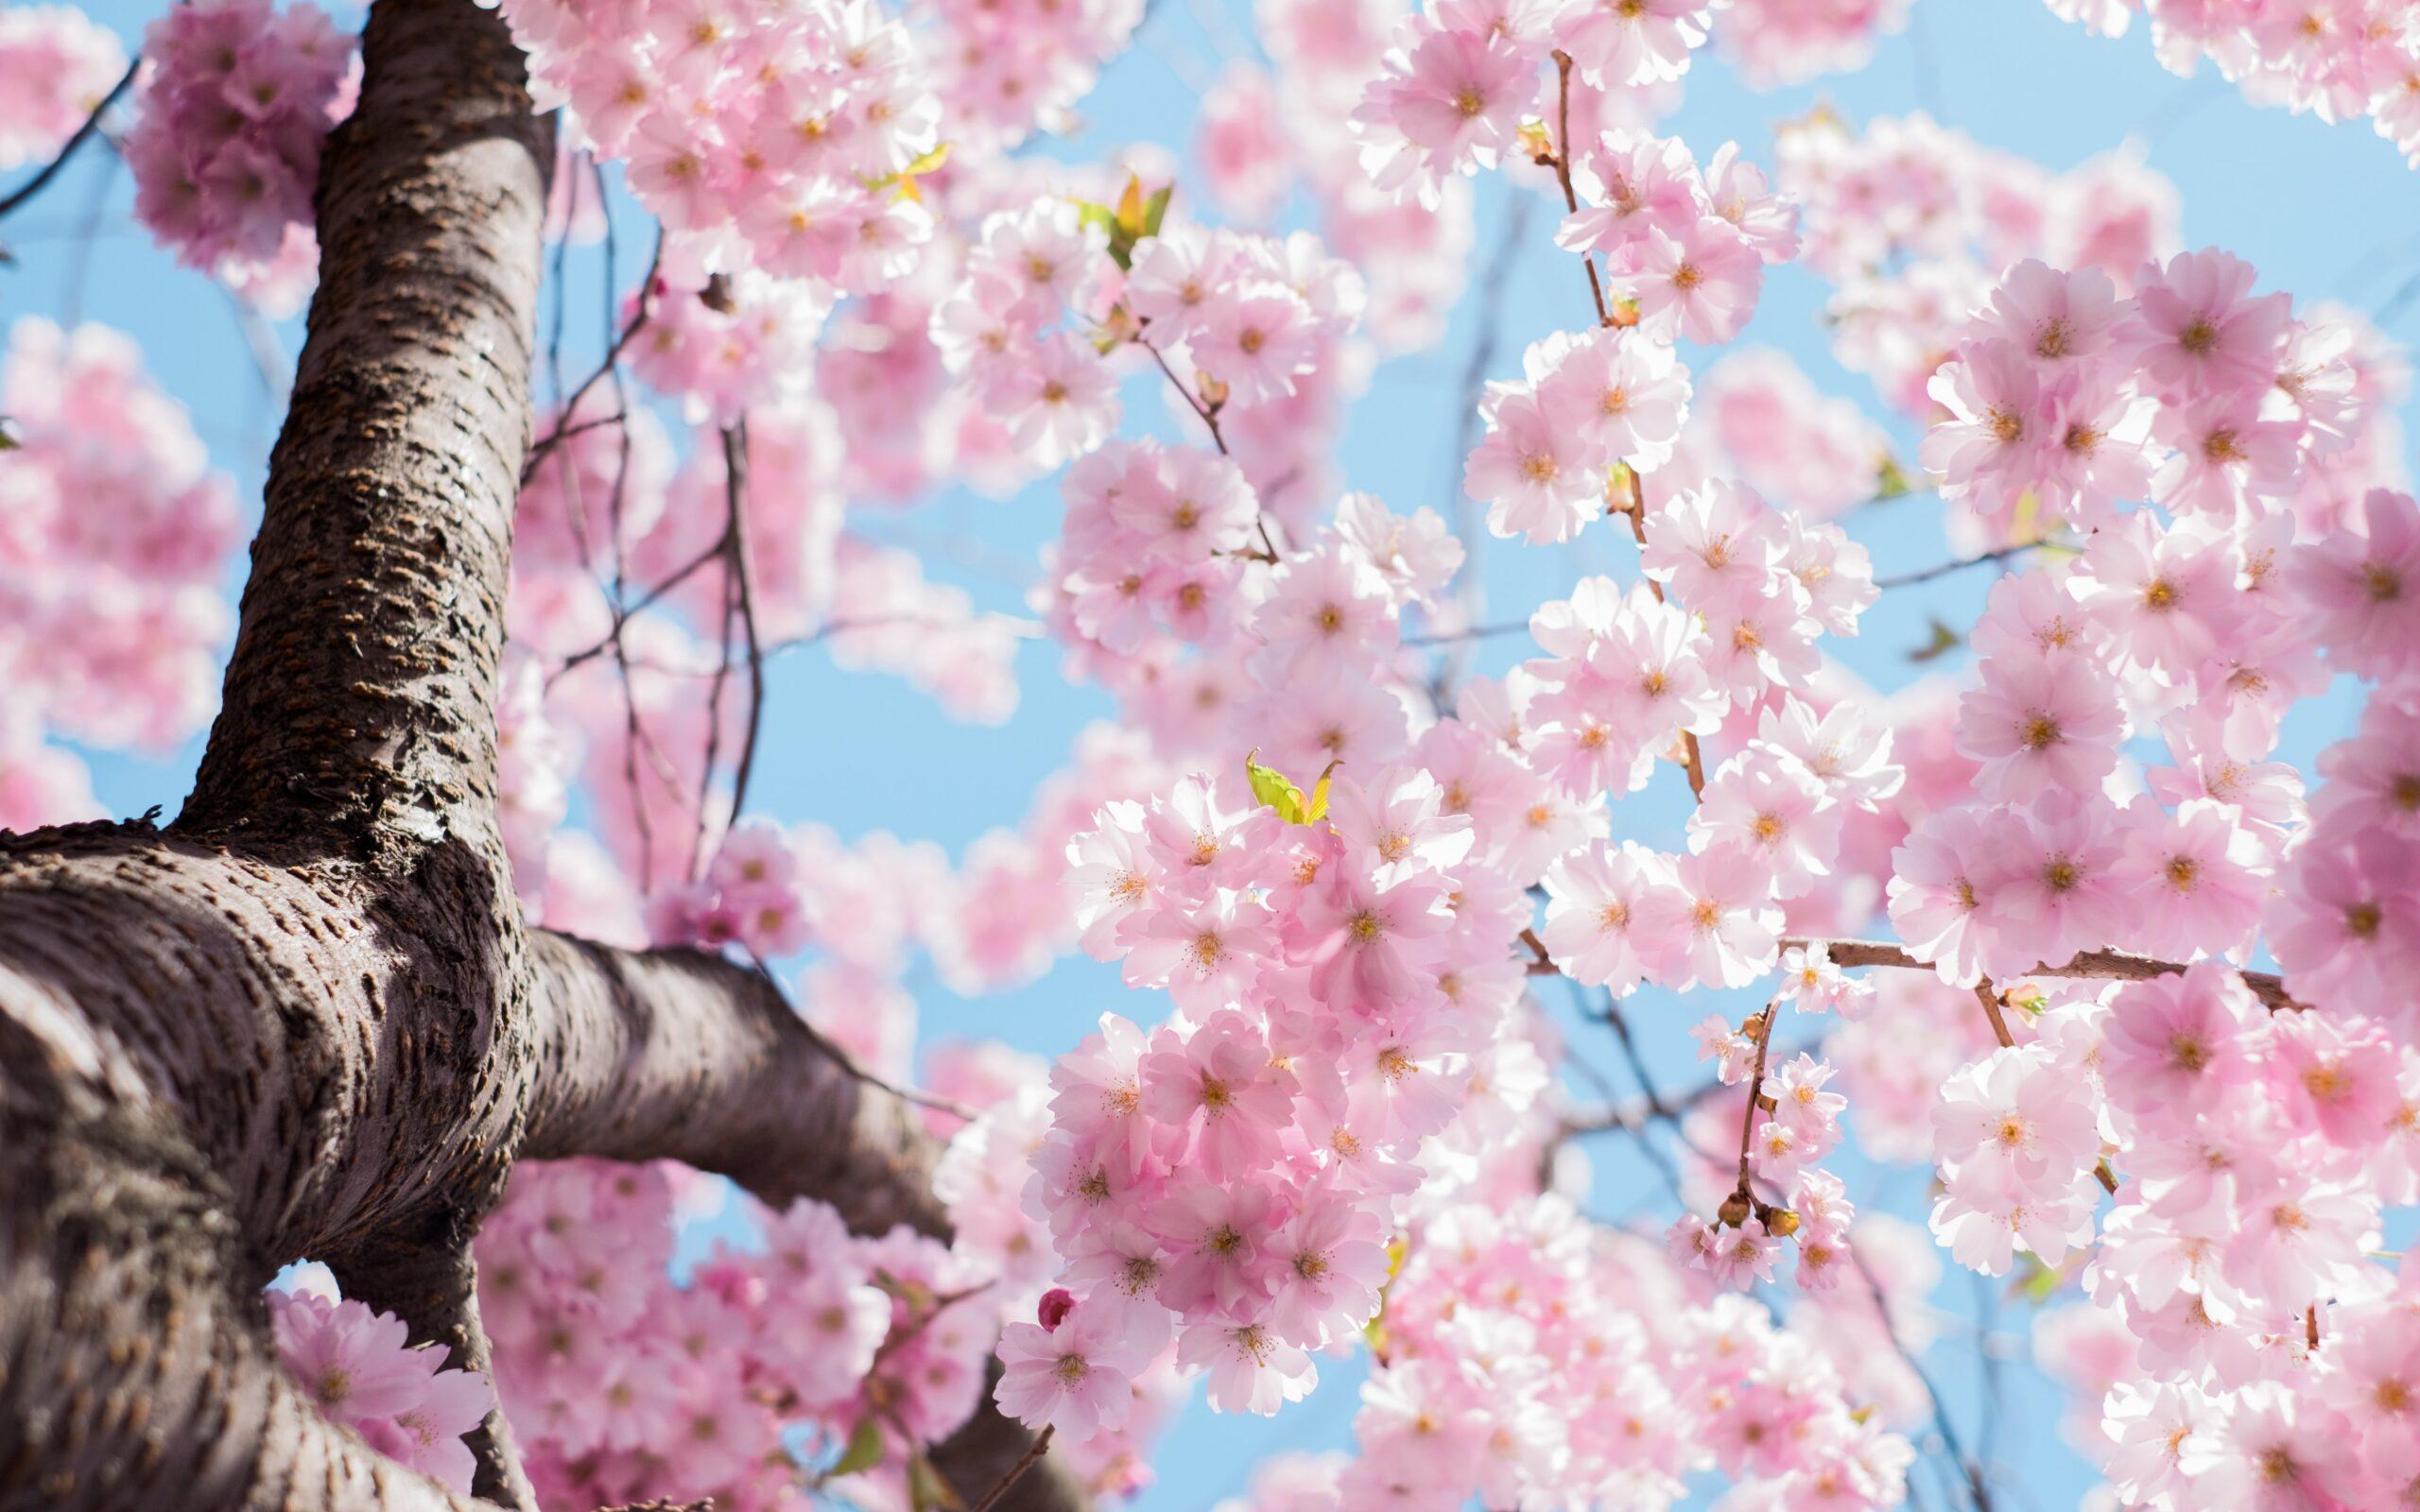 devotional, springtime, seasons, time, patience, waiting